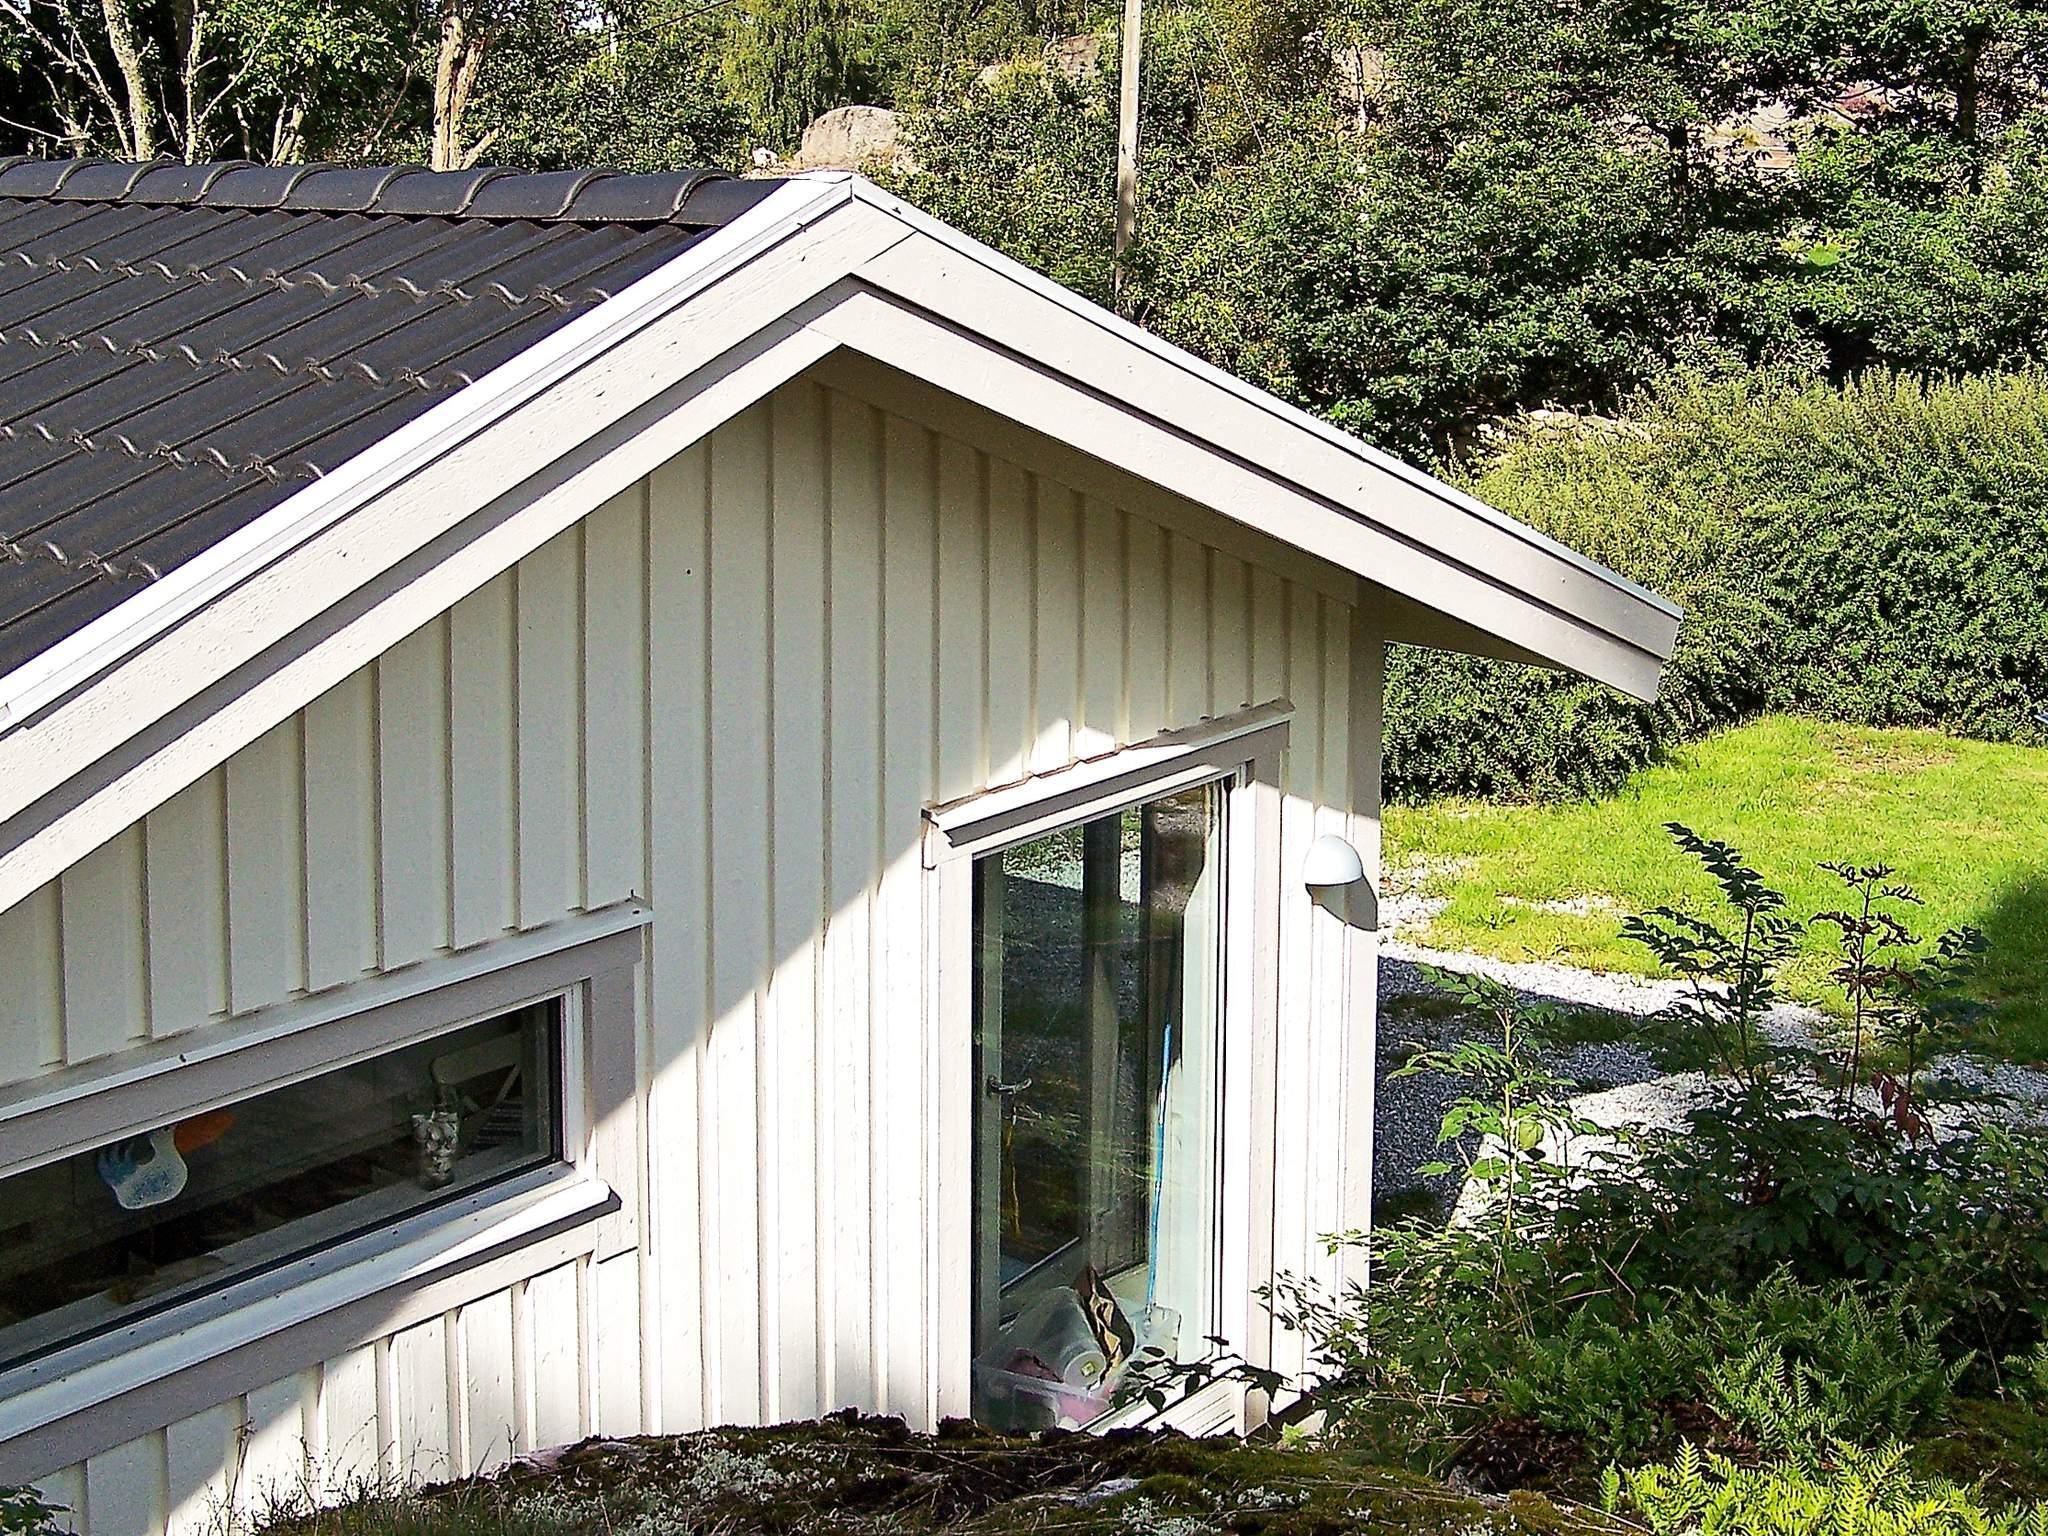 Ferienhaus Tjörn/Huseberg (672440), Kållekärr, Tjörn, Westschweden, Schweden, Bild 11